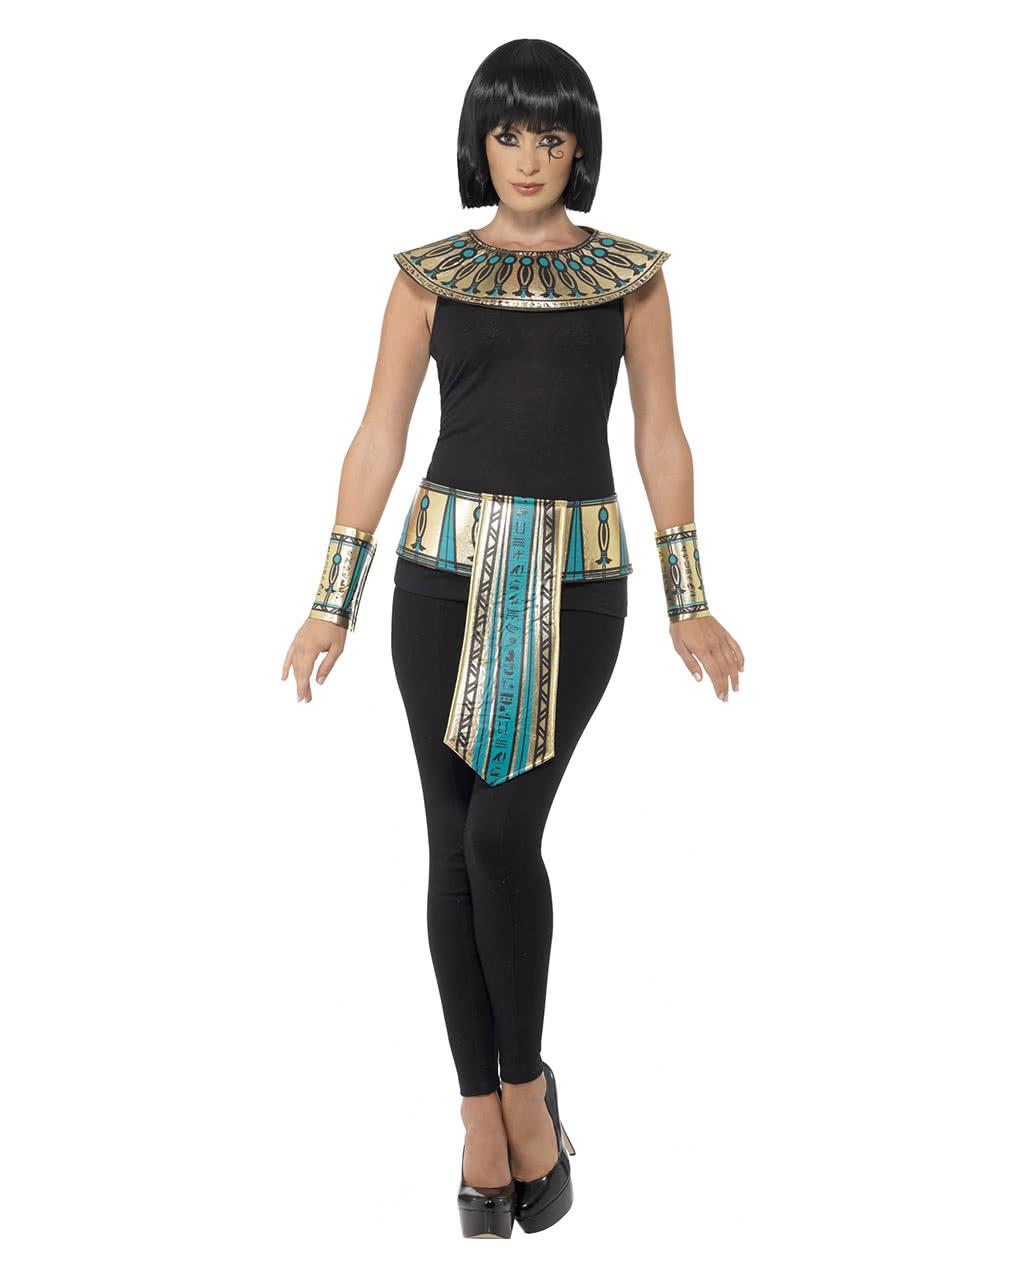 4 Tlg Agypterin Verkleidungs Set Pharaonin Kostum Zubehor